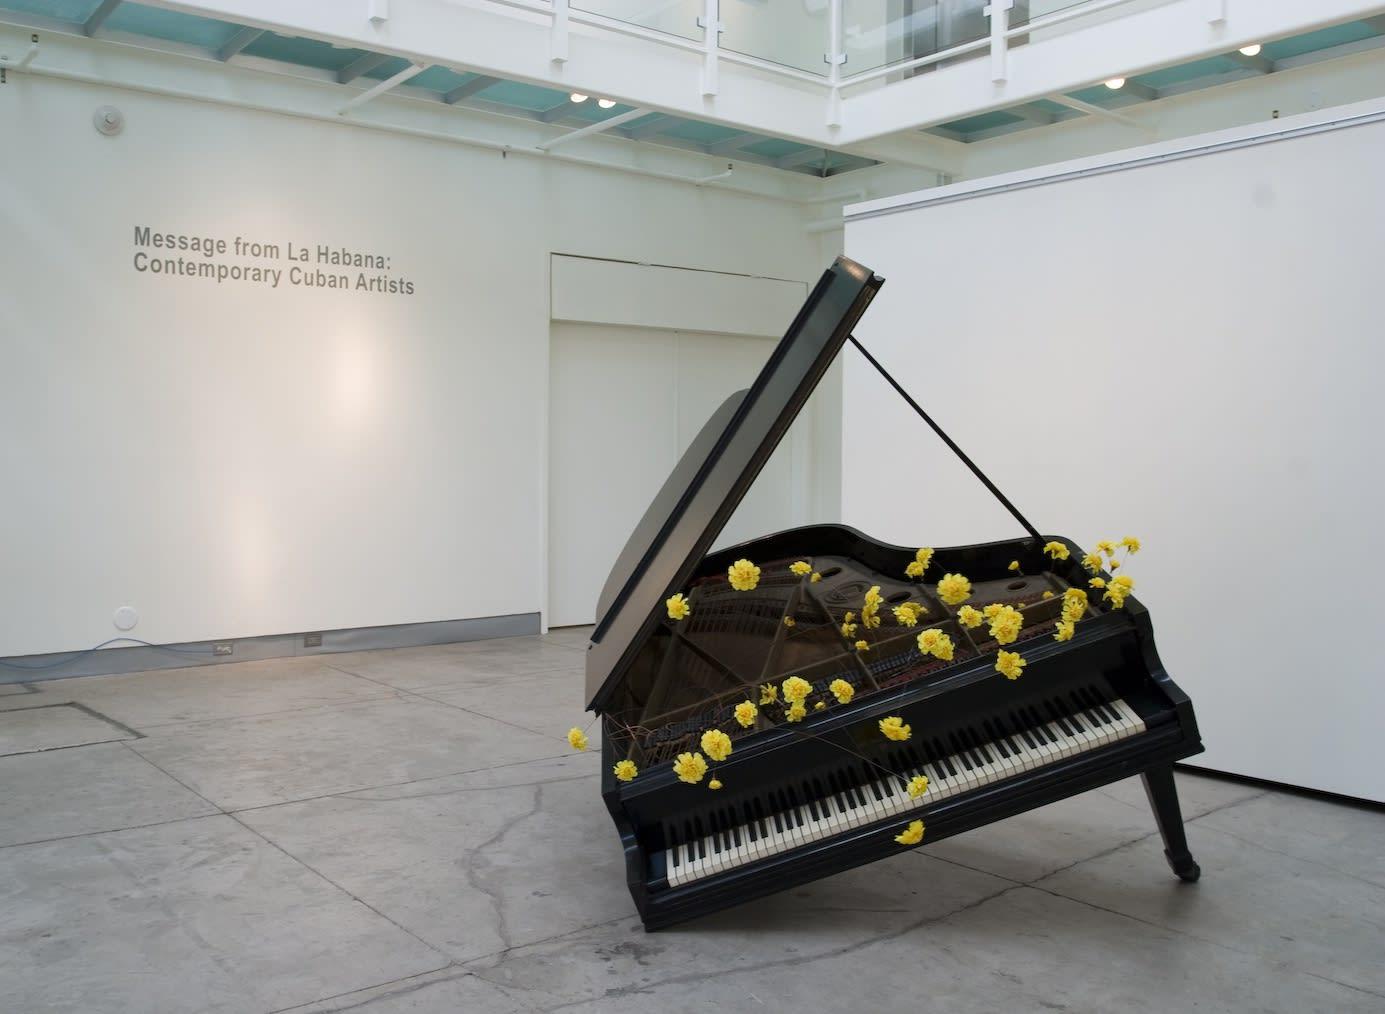 Message From La Habana: Six Contemporary Cuban Artists